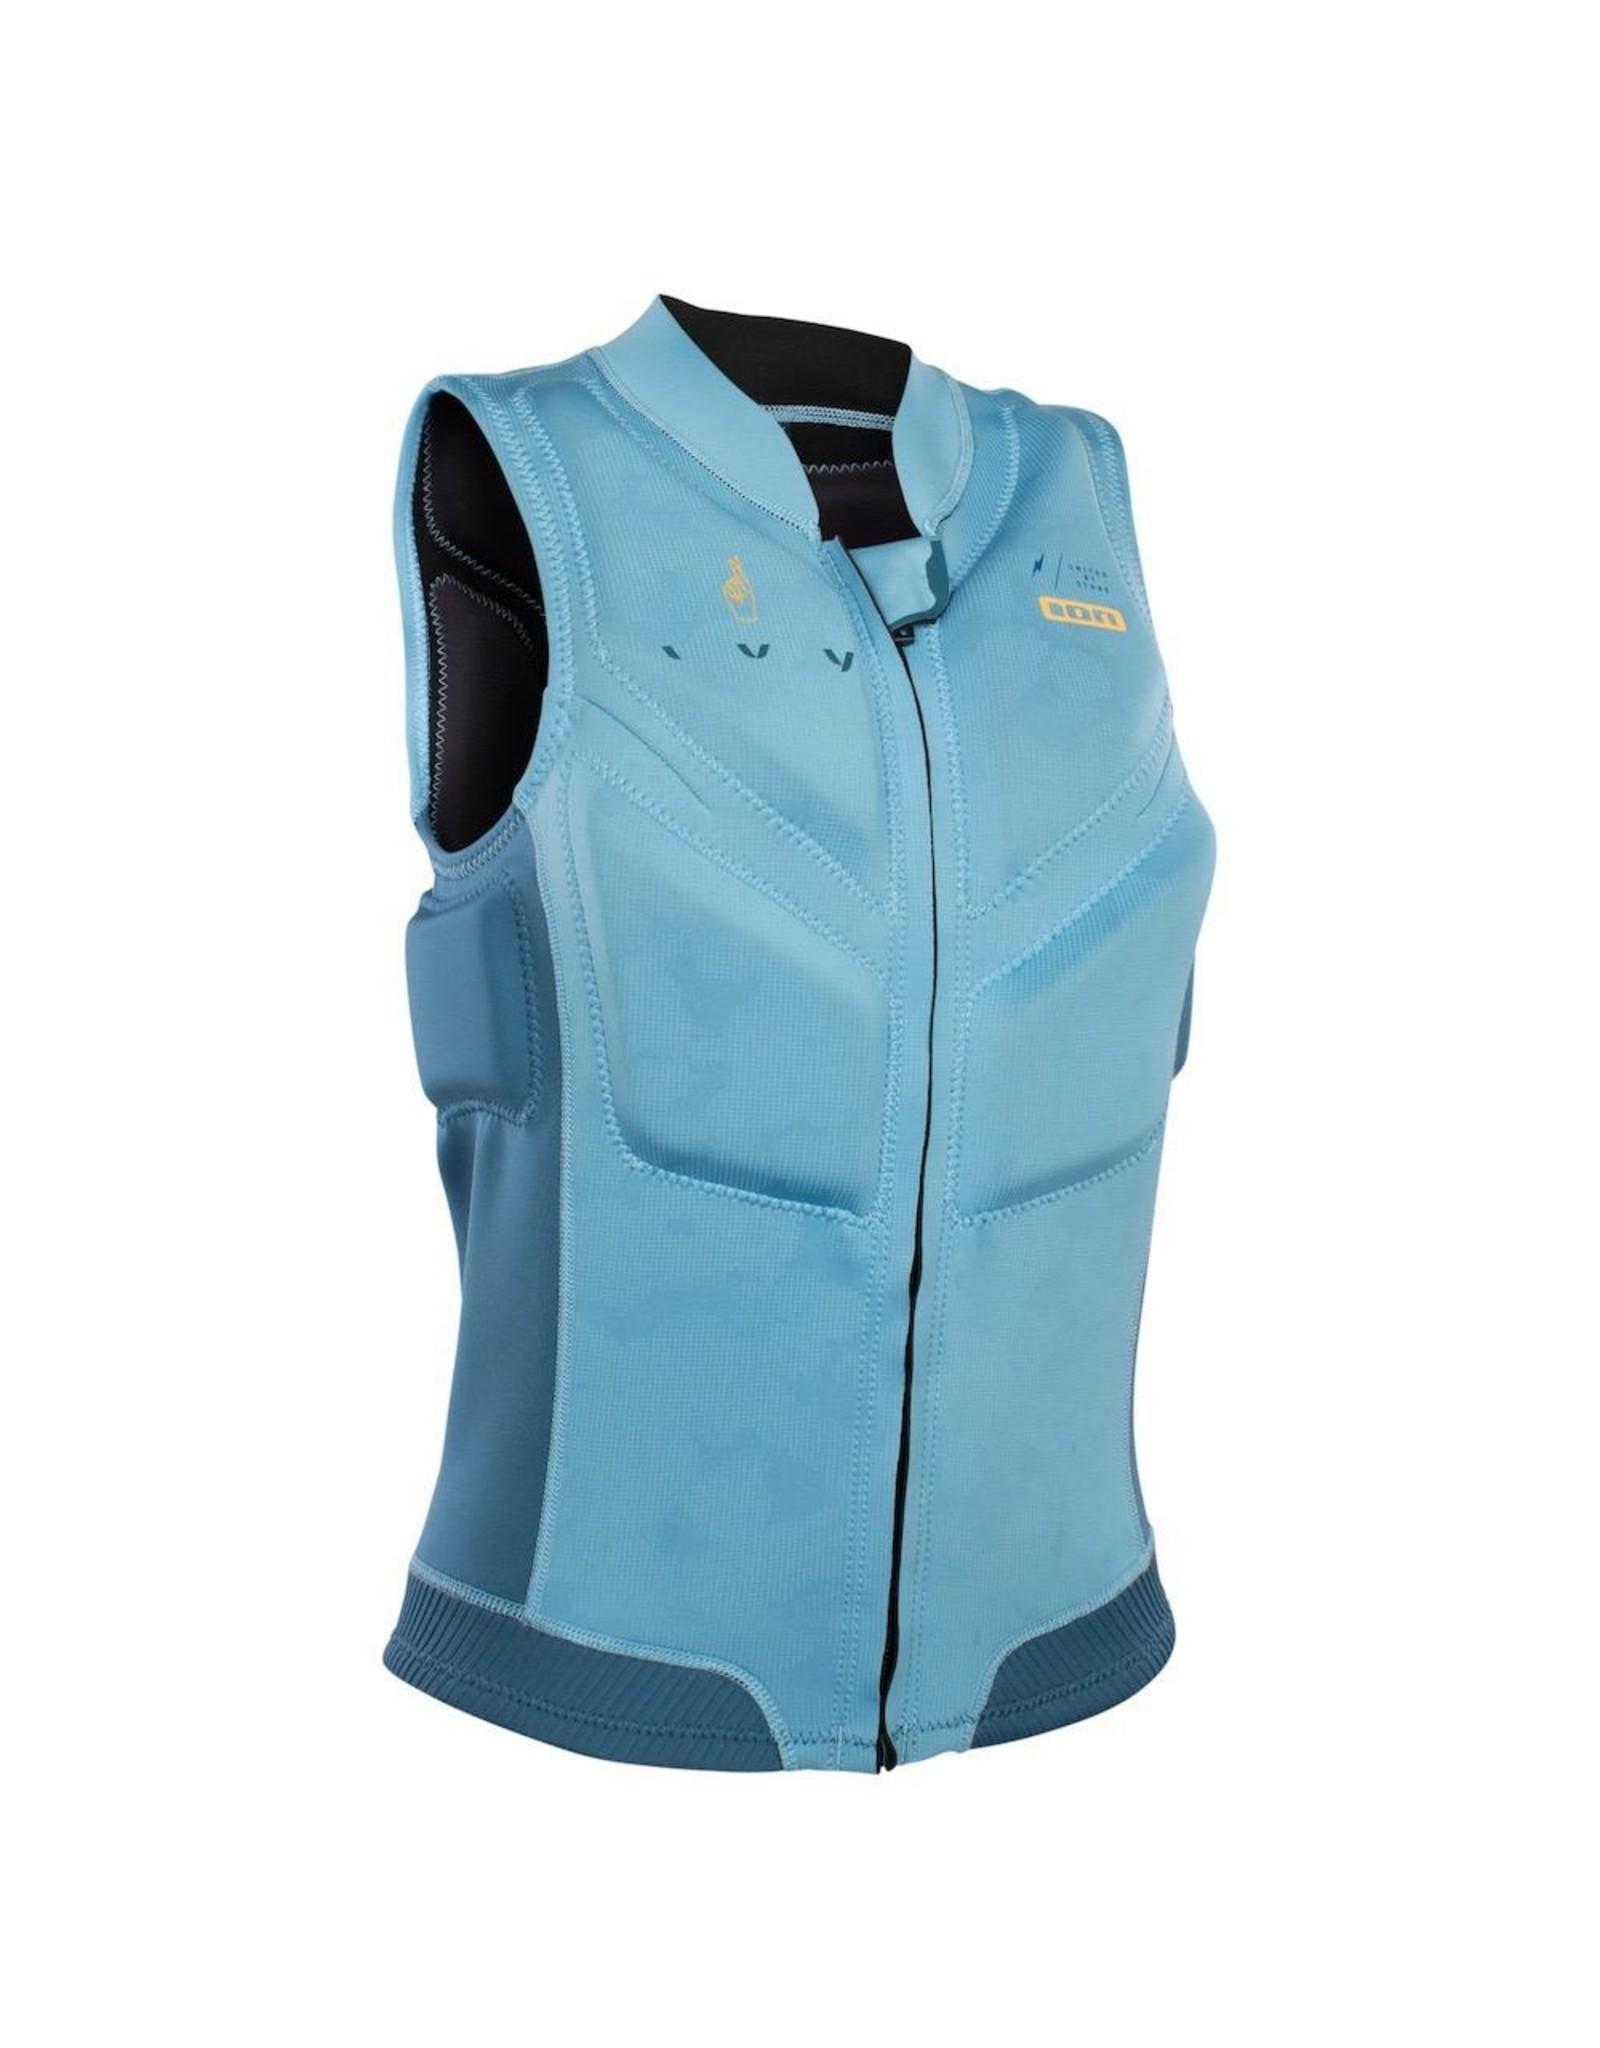 Ion - Ivy Vest Women FZ - 140/10 - Sky Blue